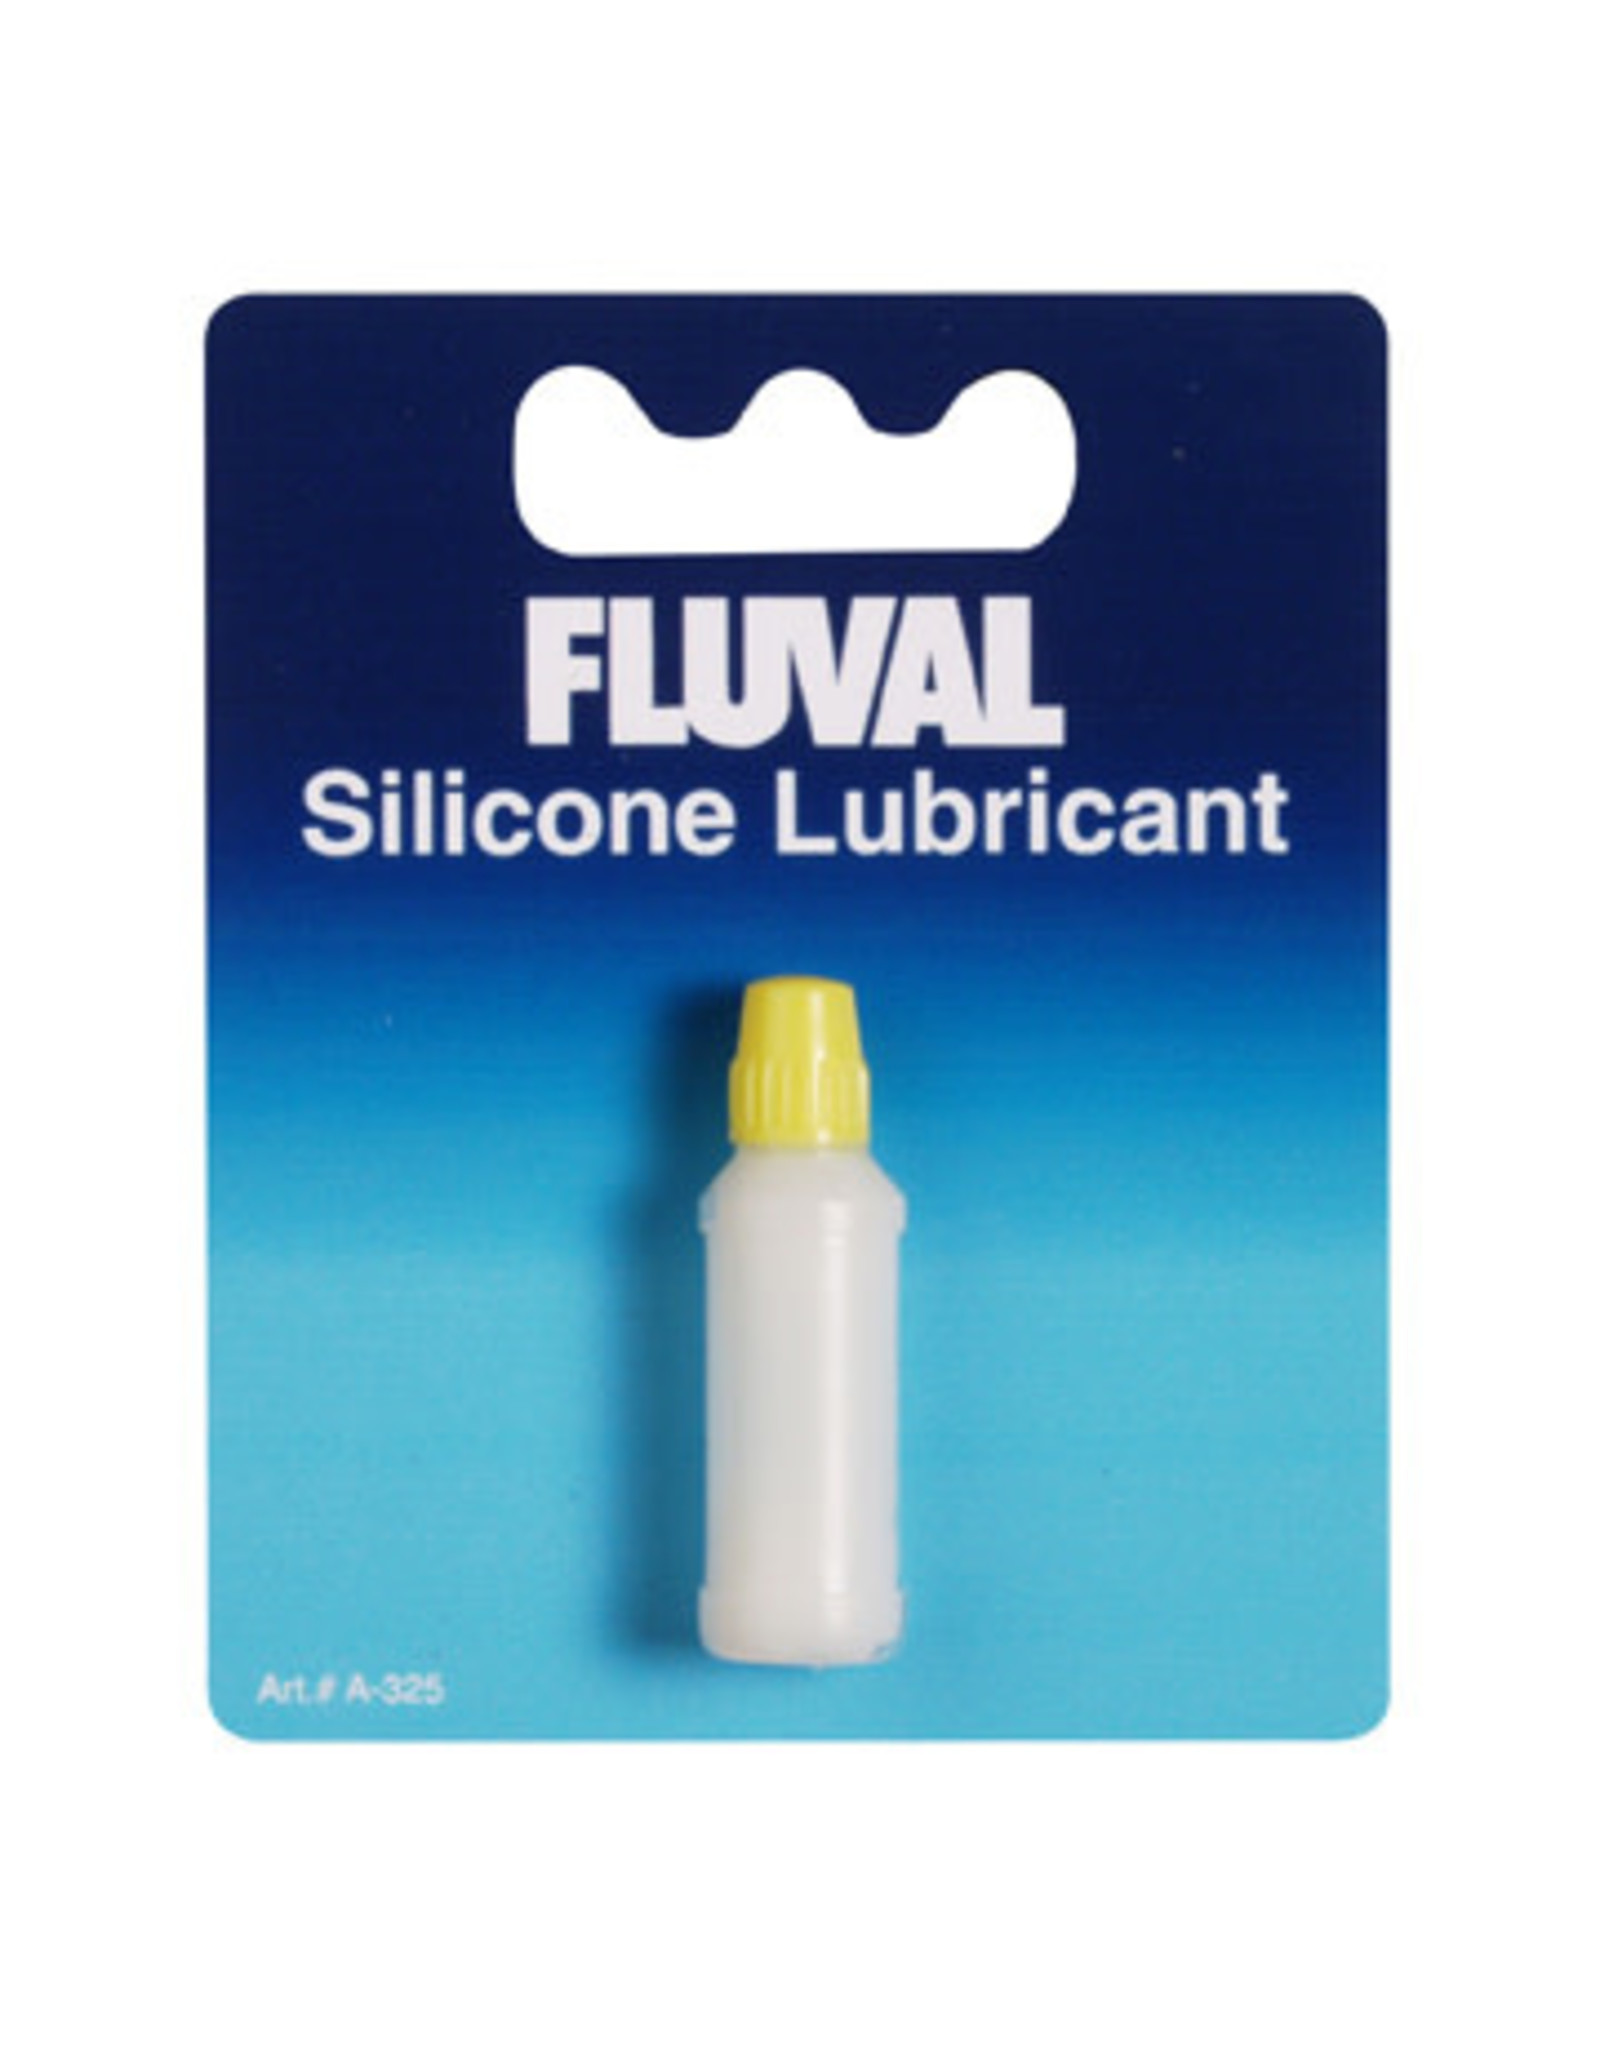 Fluval Fluval Silicone Lubricant